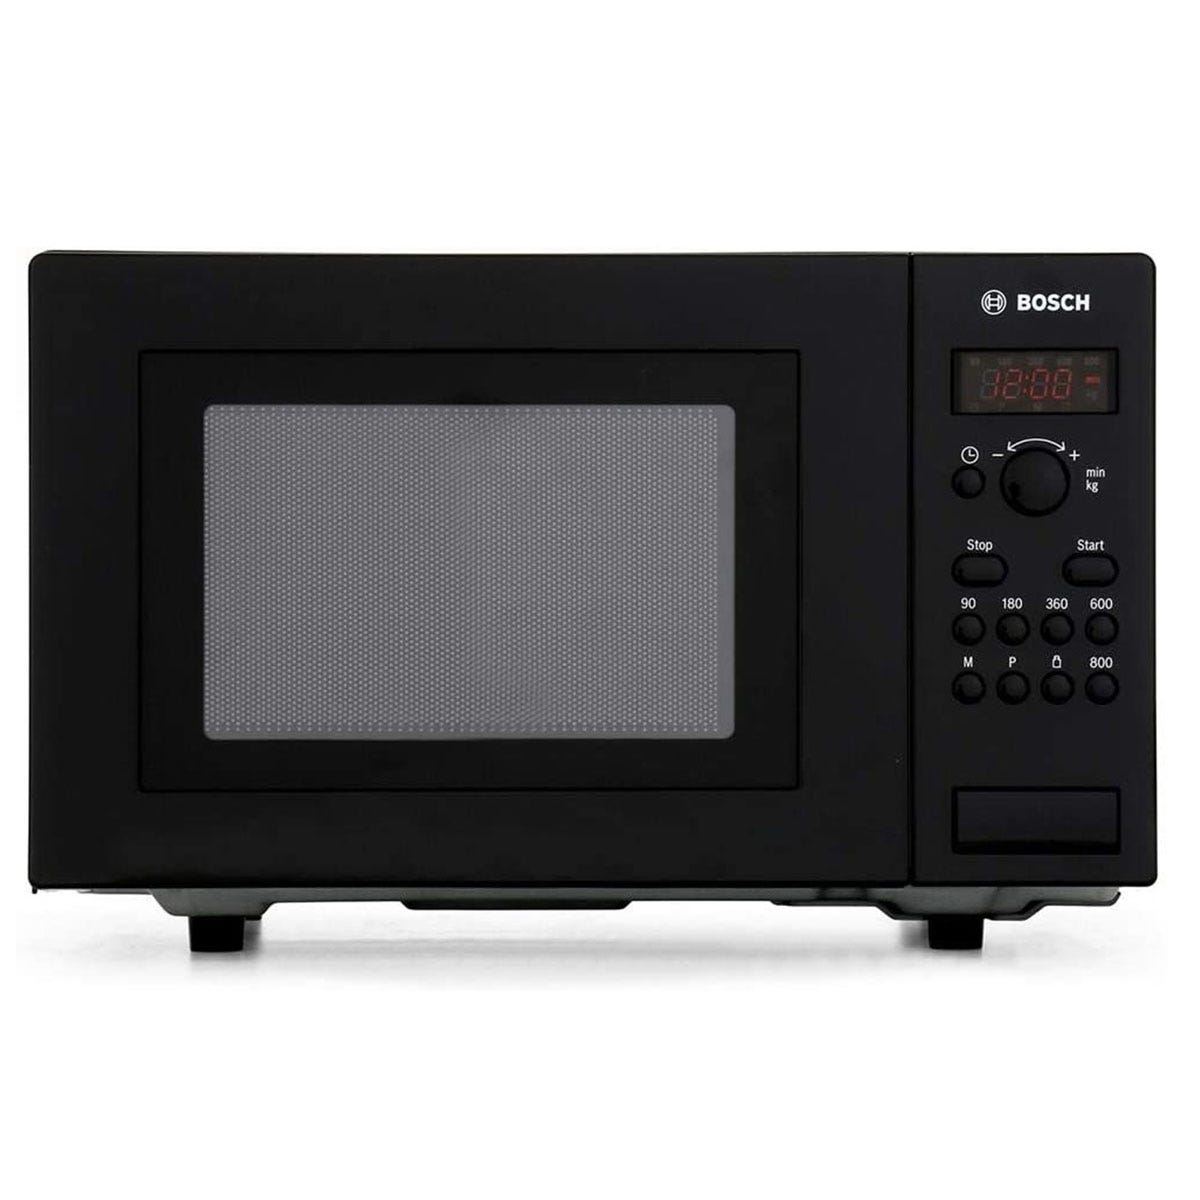 Bosch HMT75M461B Compact Digital Microwave Oven - Black